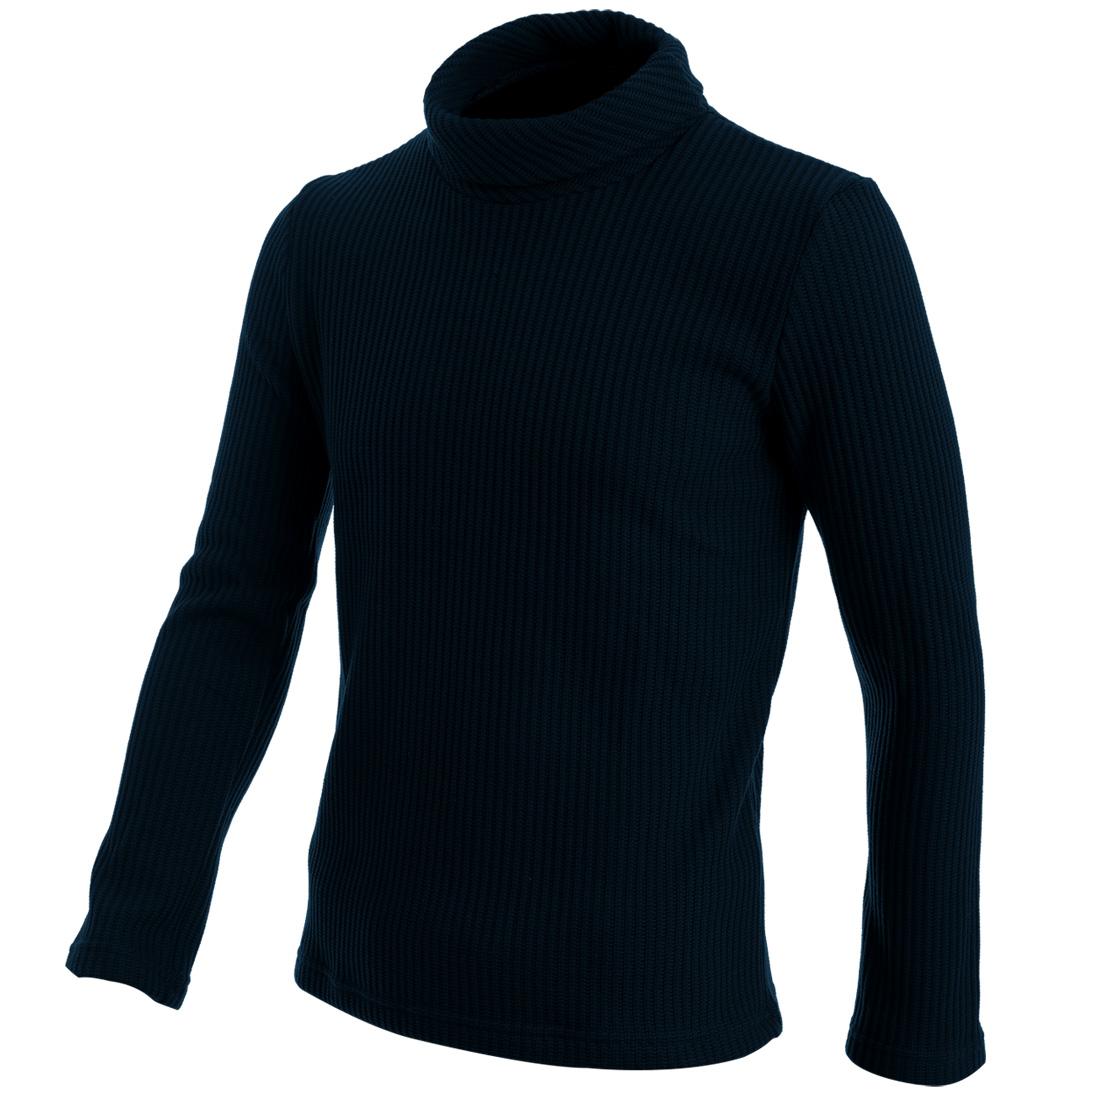 Mans Pure Dark Blue Fleece Lined Warm Winter Sweater S